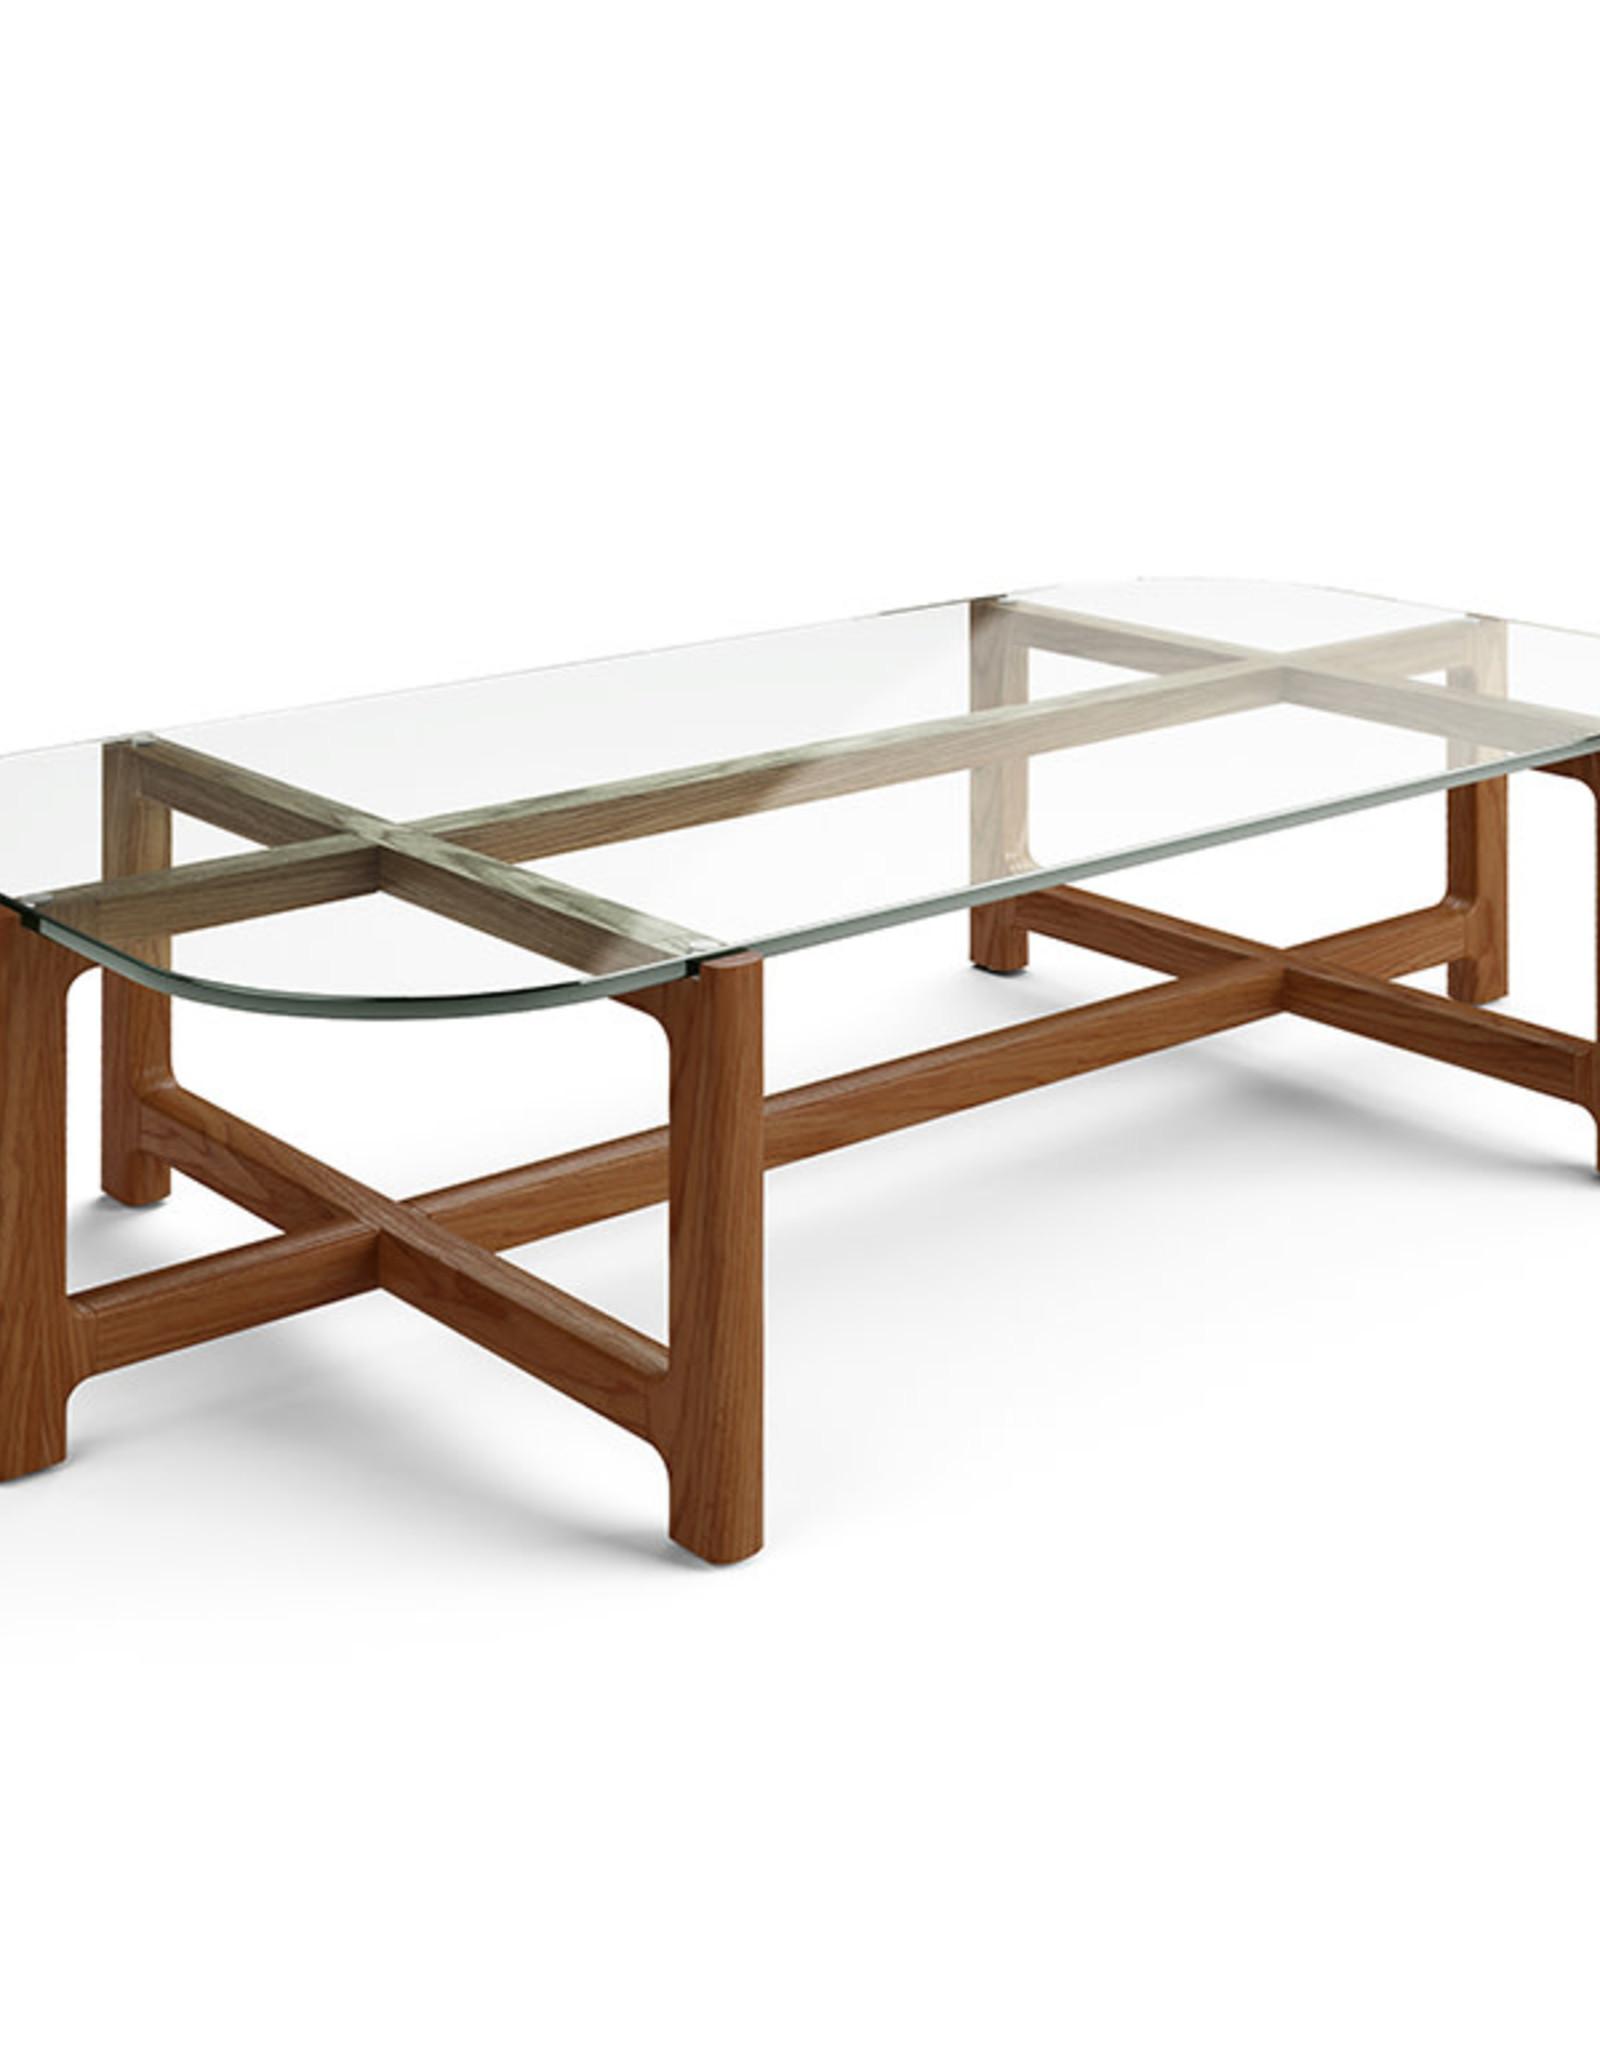 Gus* Modern Quarry Rectangular Coffee Table